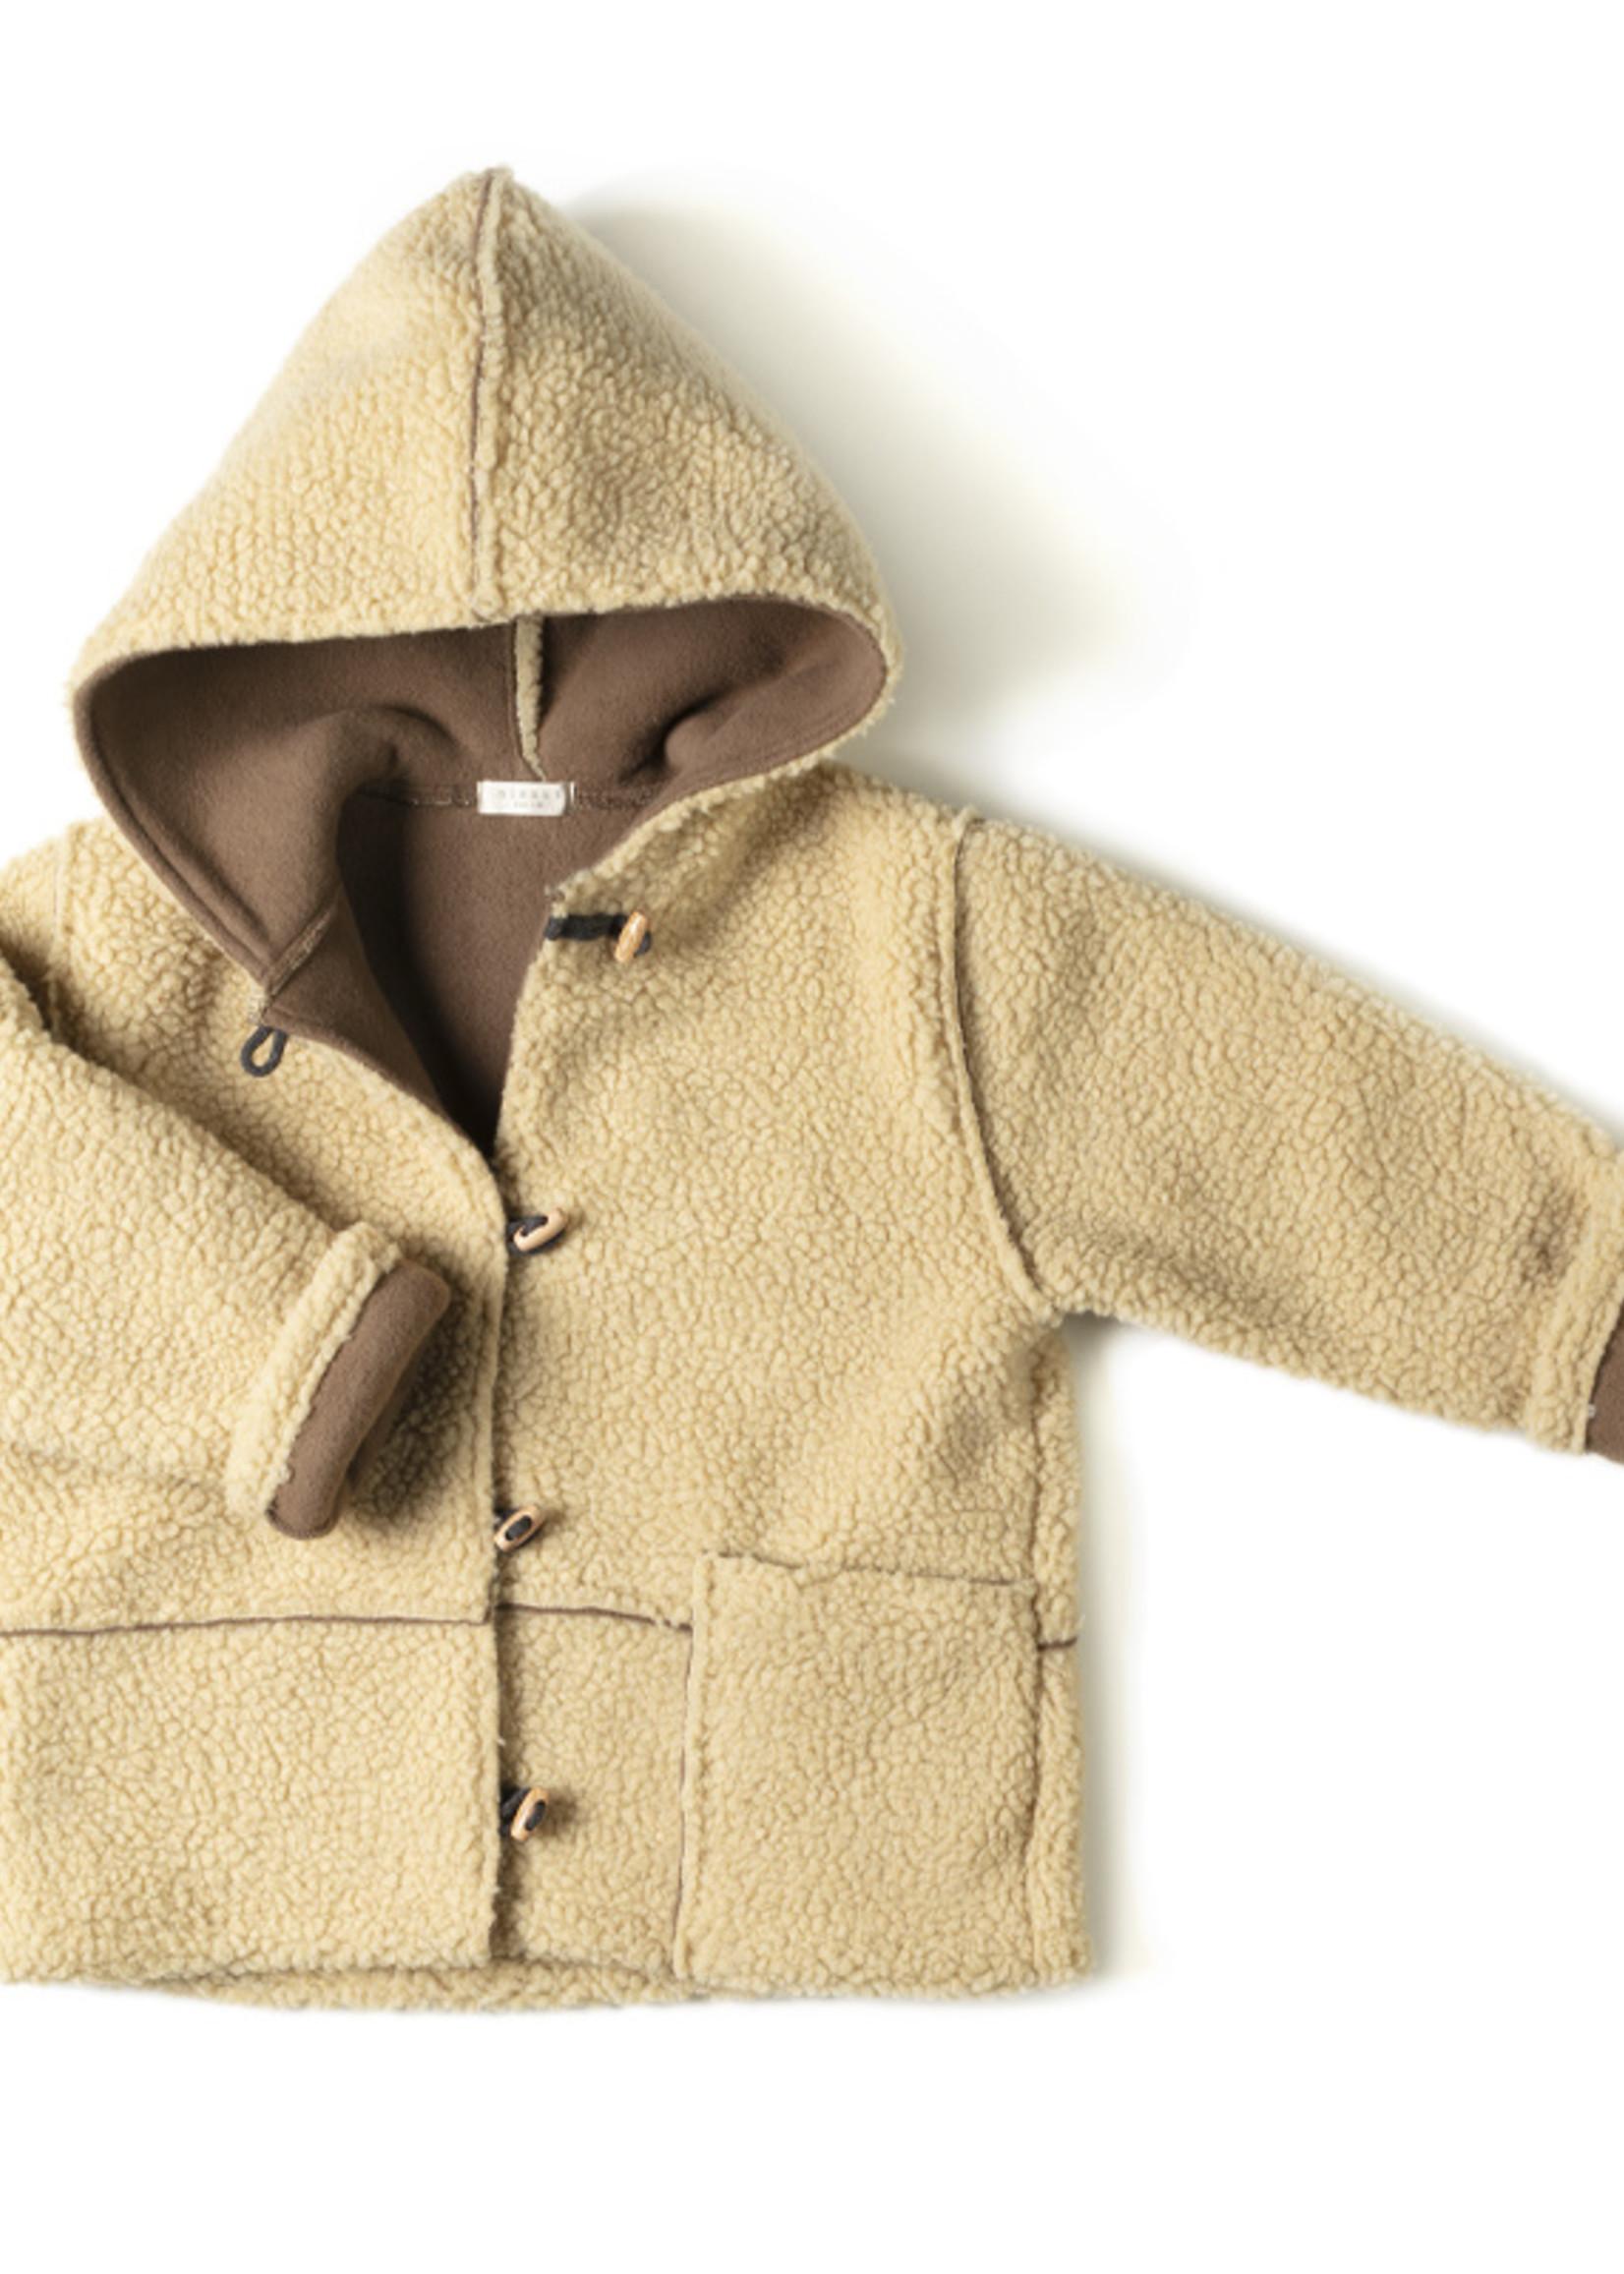 Nixnut Winter Jacket - Lammy